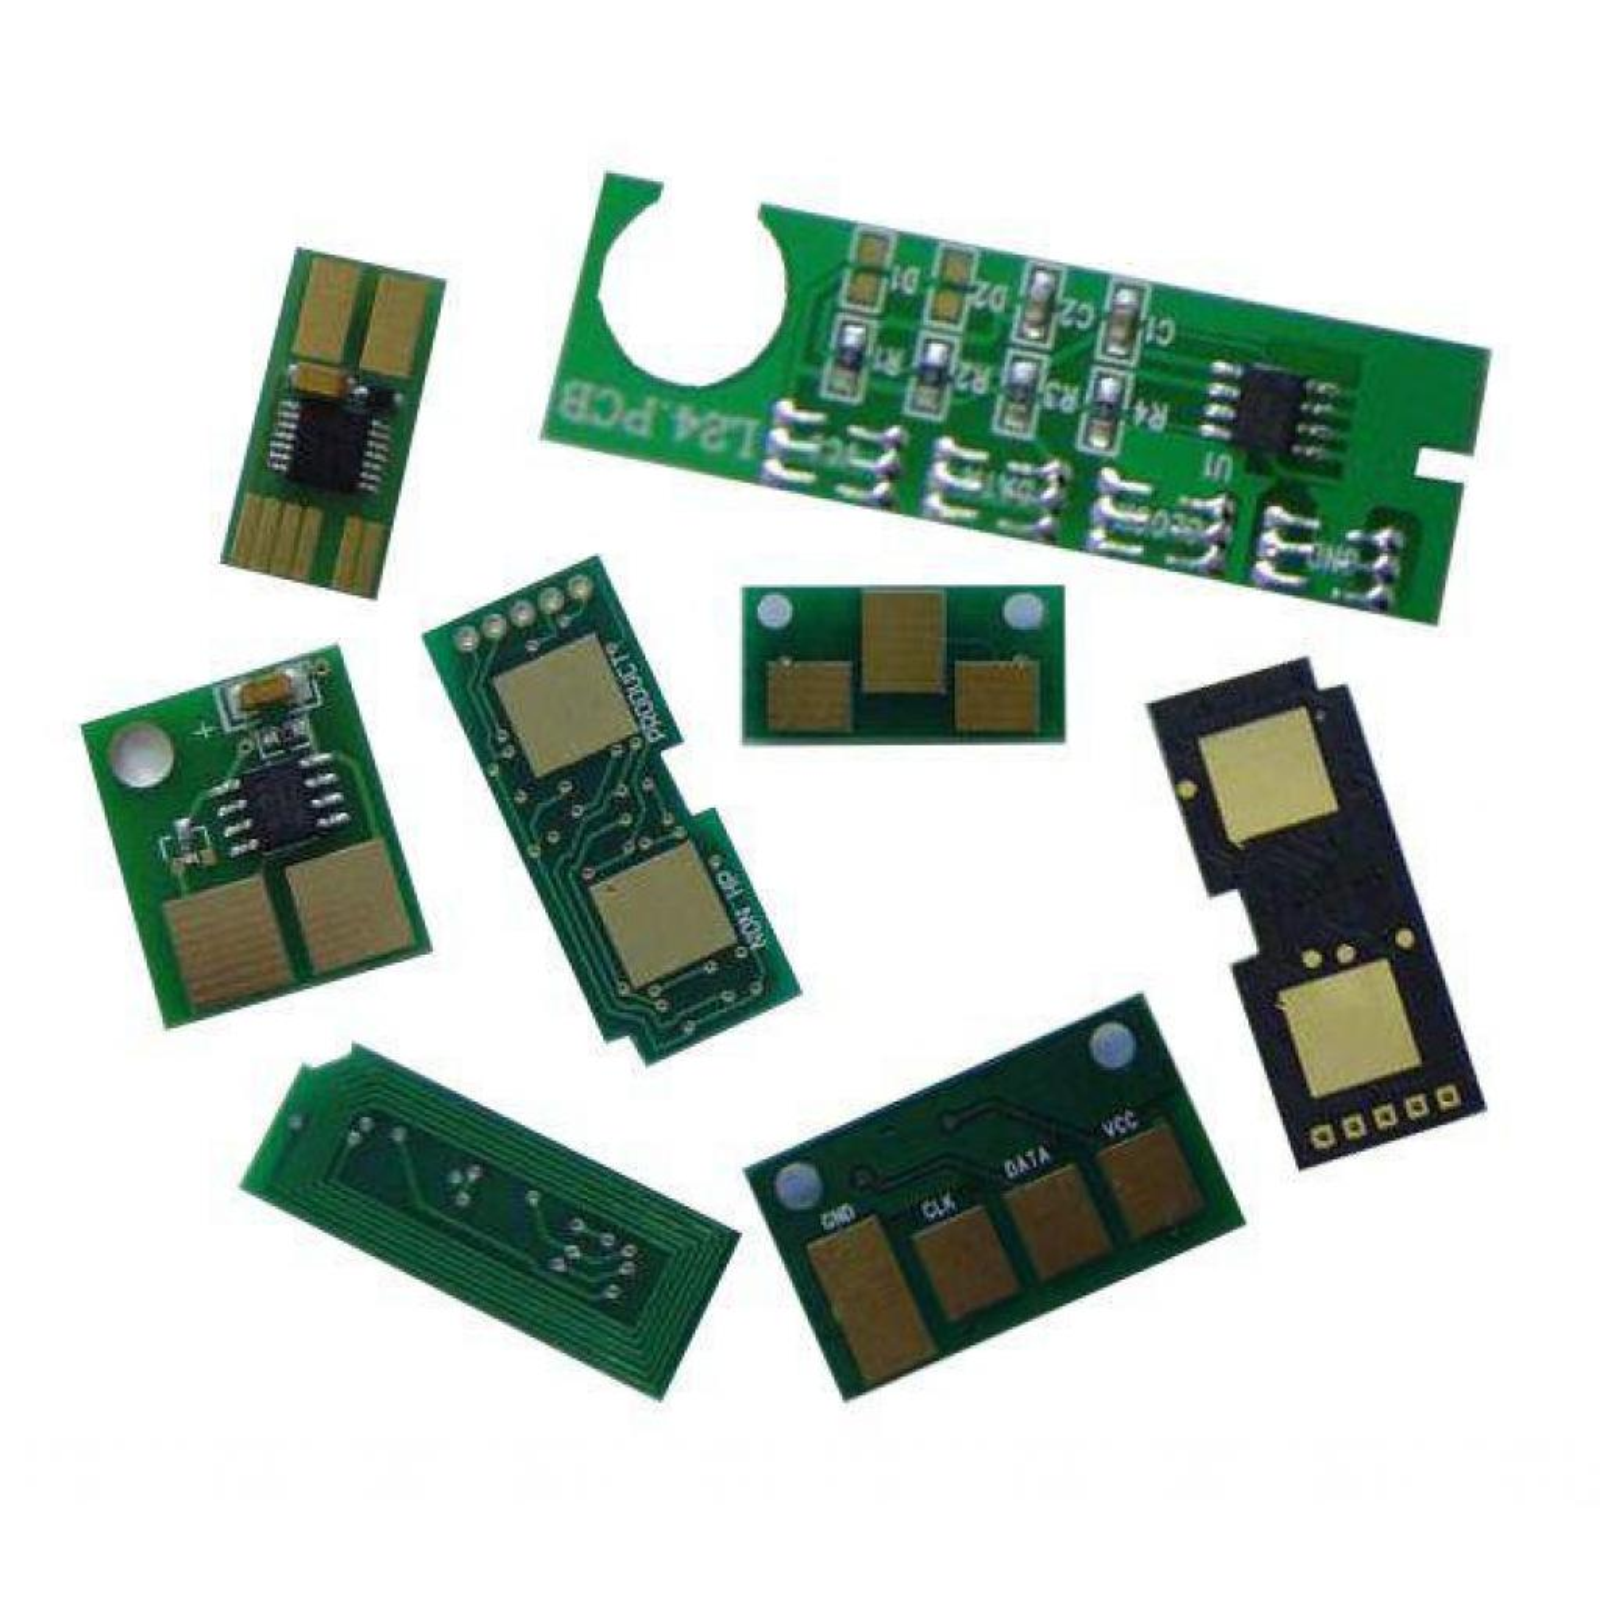 Чип для картриджа CANON 051 ДЛЯ LBP162 1,4K Everprint (CHIP-CAN-051)